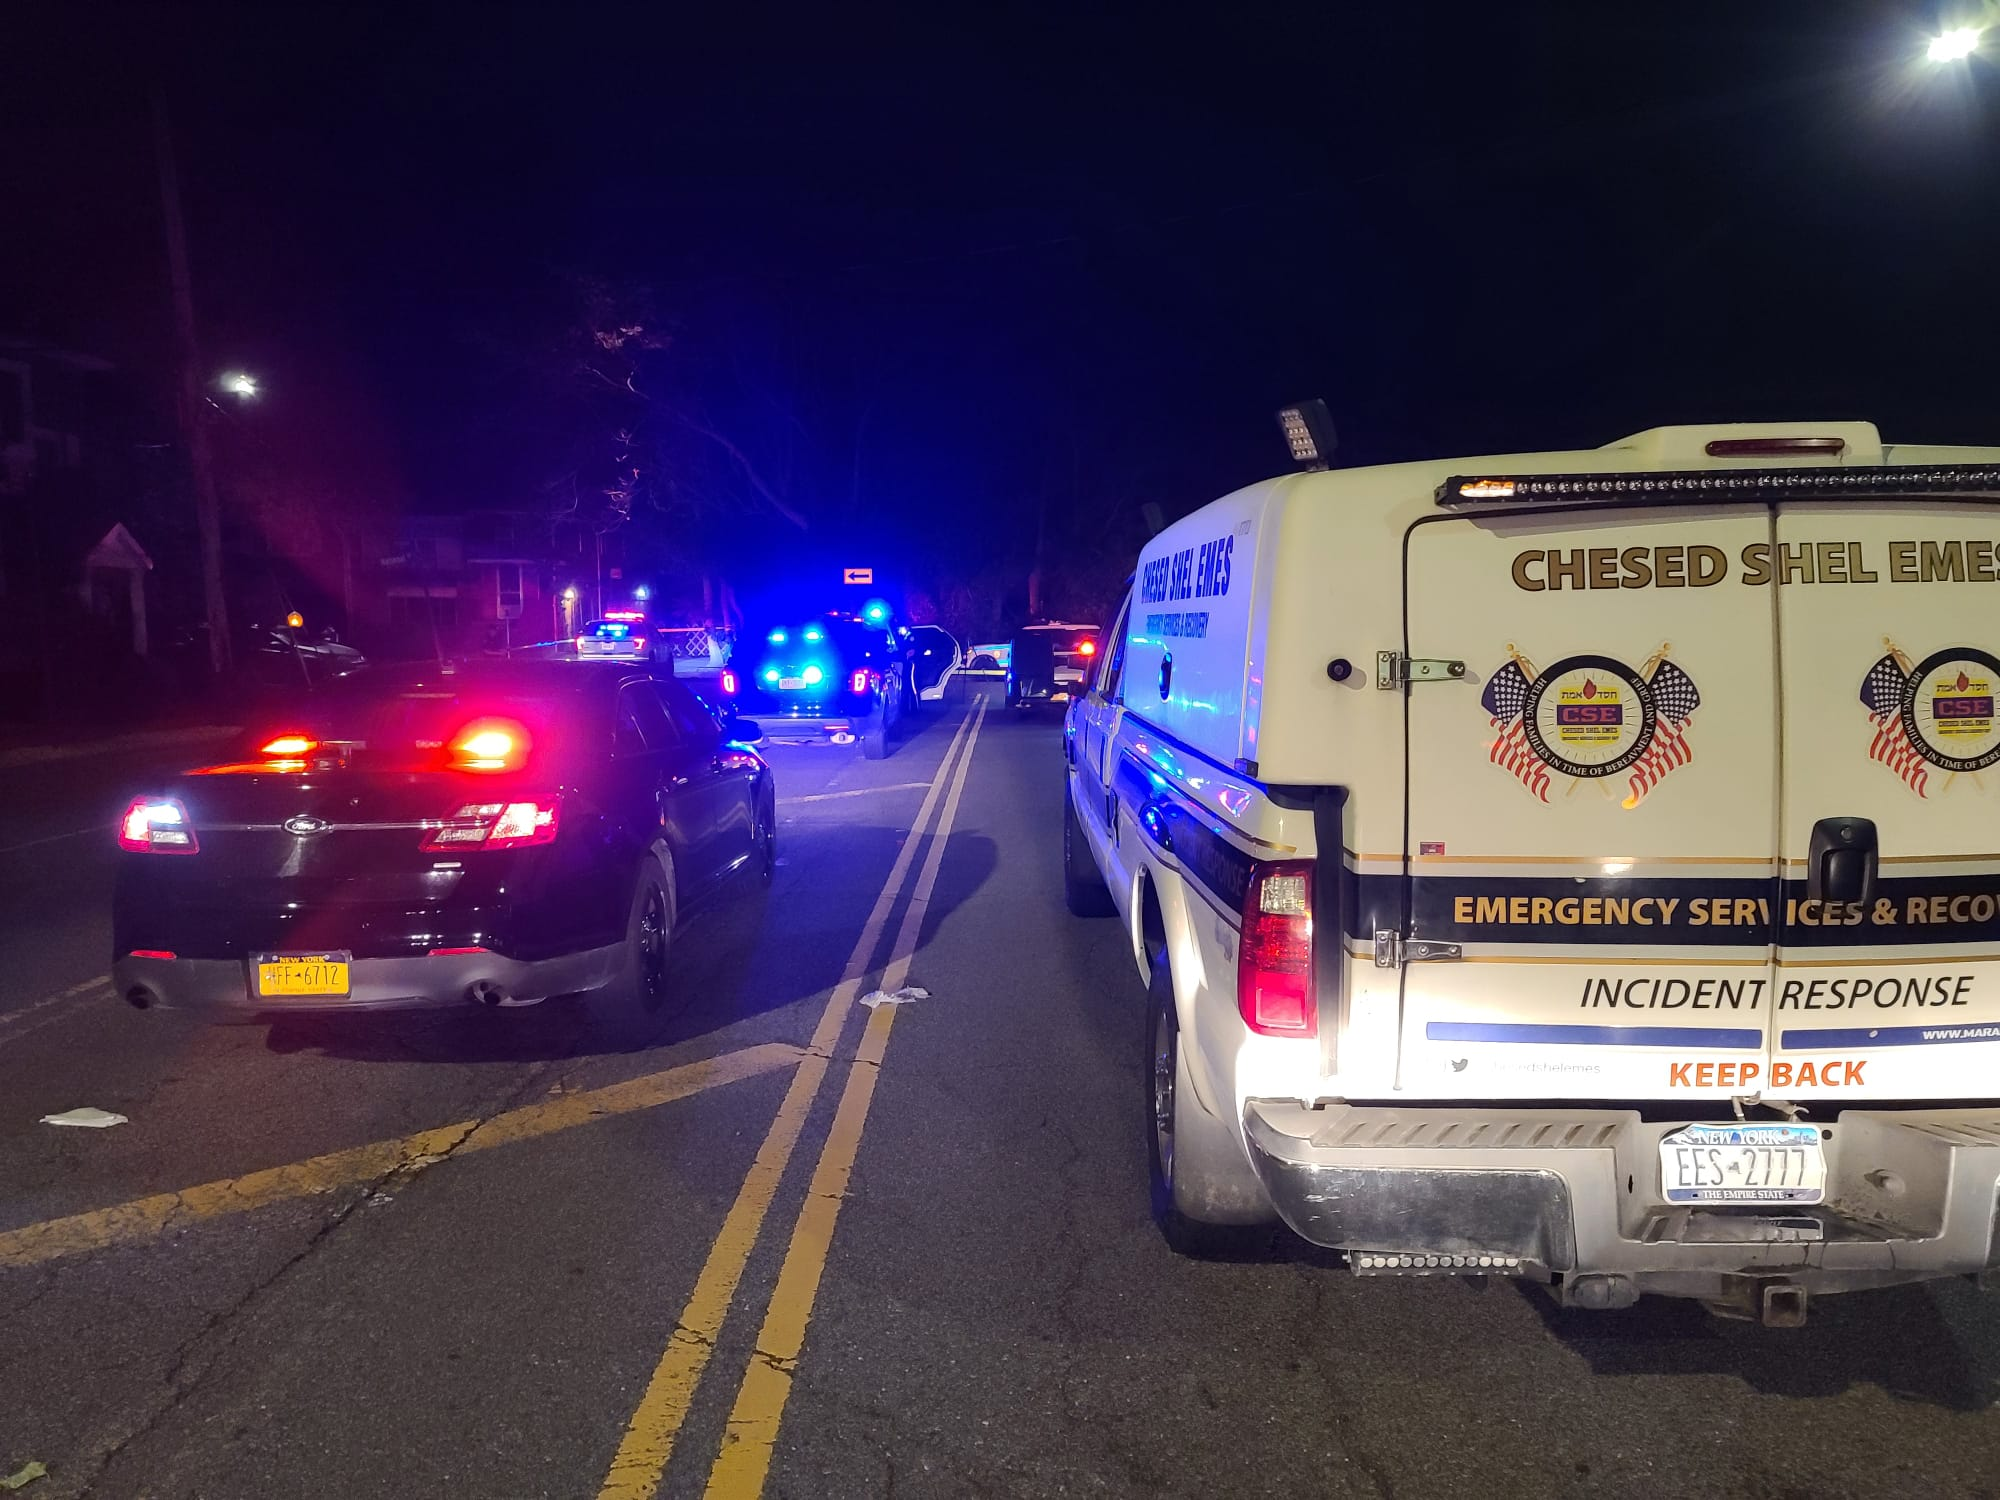 TRAGEDY IN CANARSIE: Jewish teen killed in fatal car crash, 4 others injured.